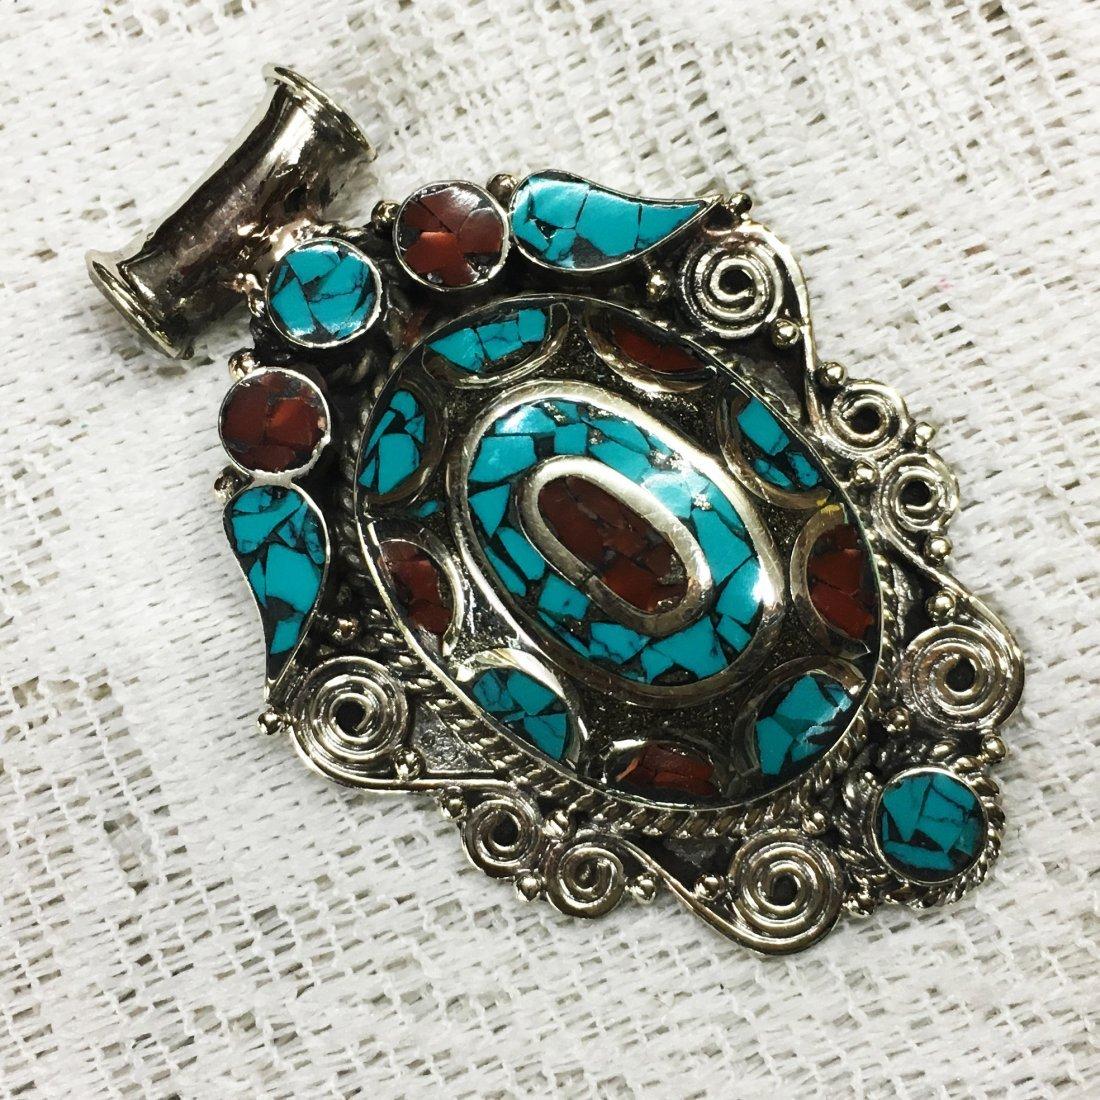 Buddhist Turquoise & Coral Vintage Tibet Pendant